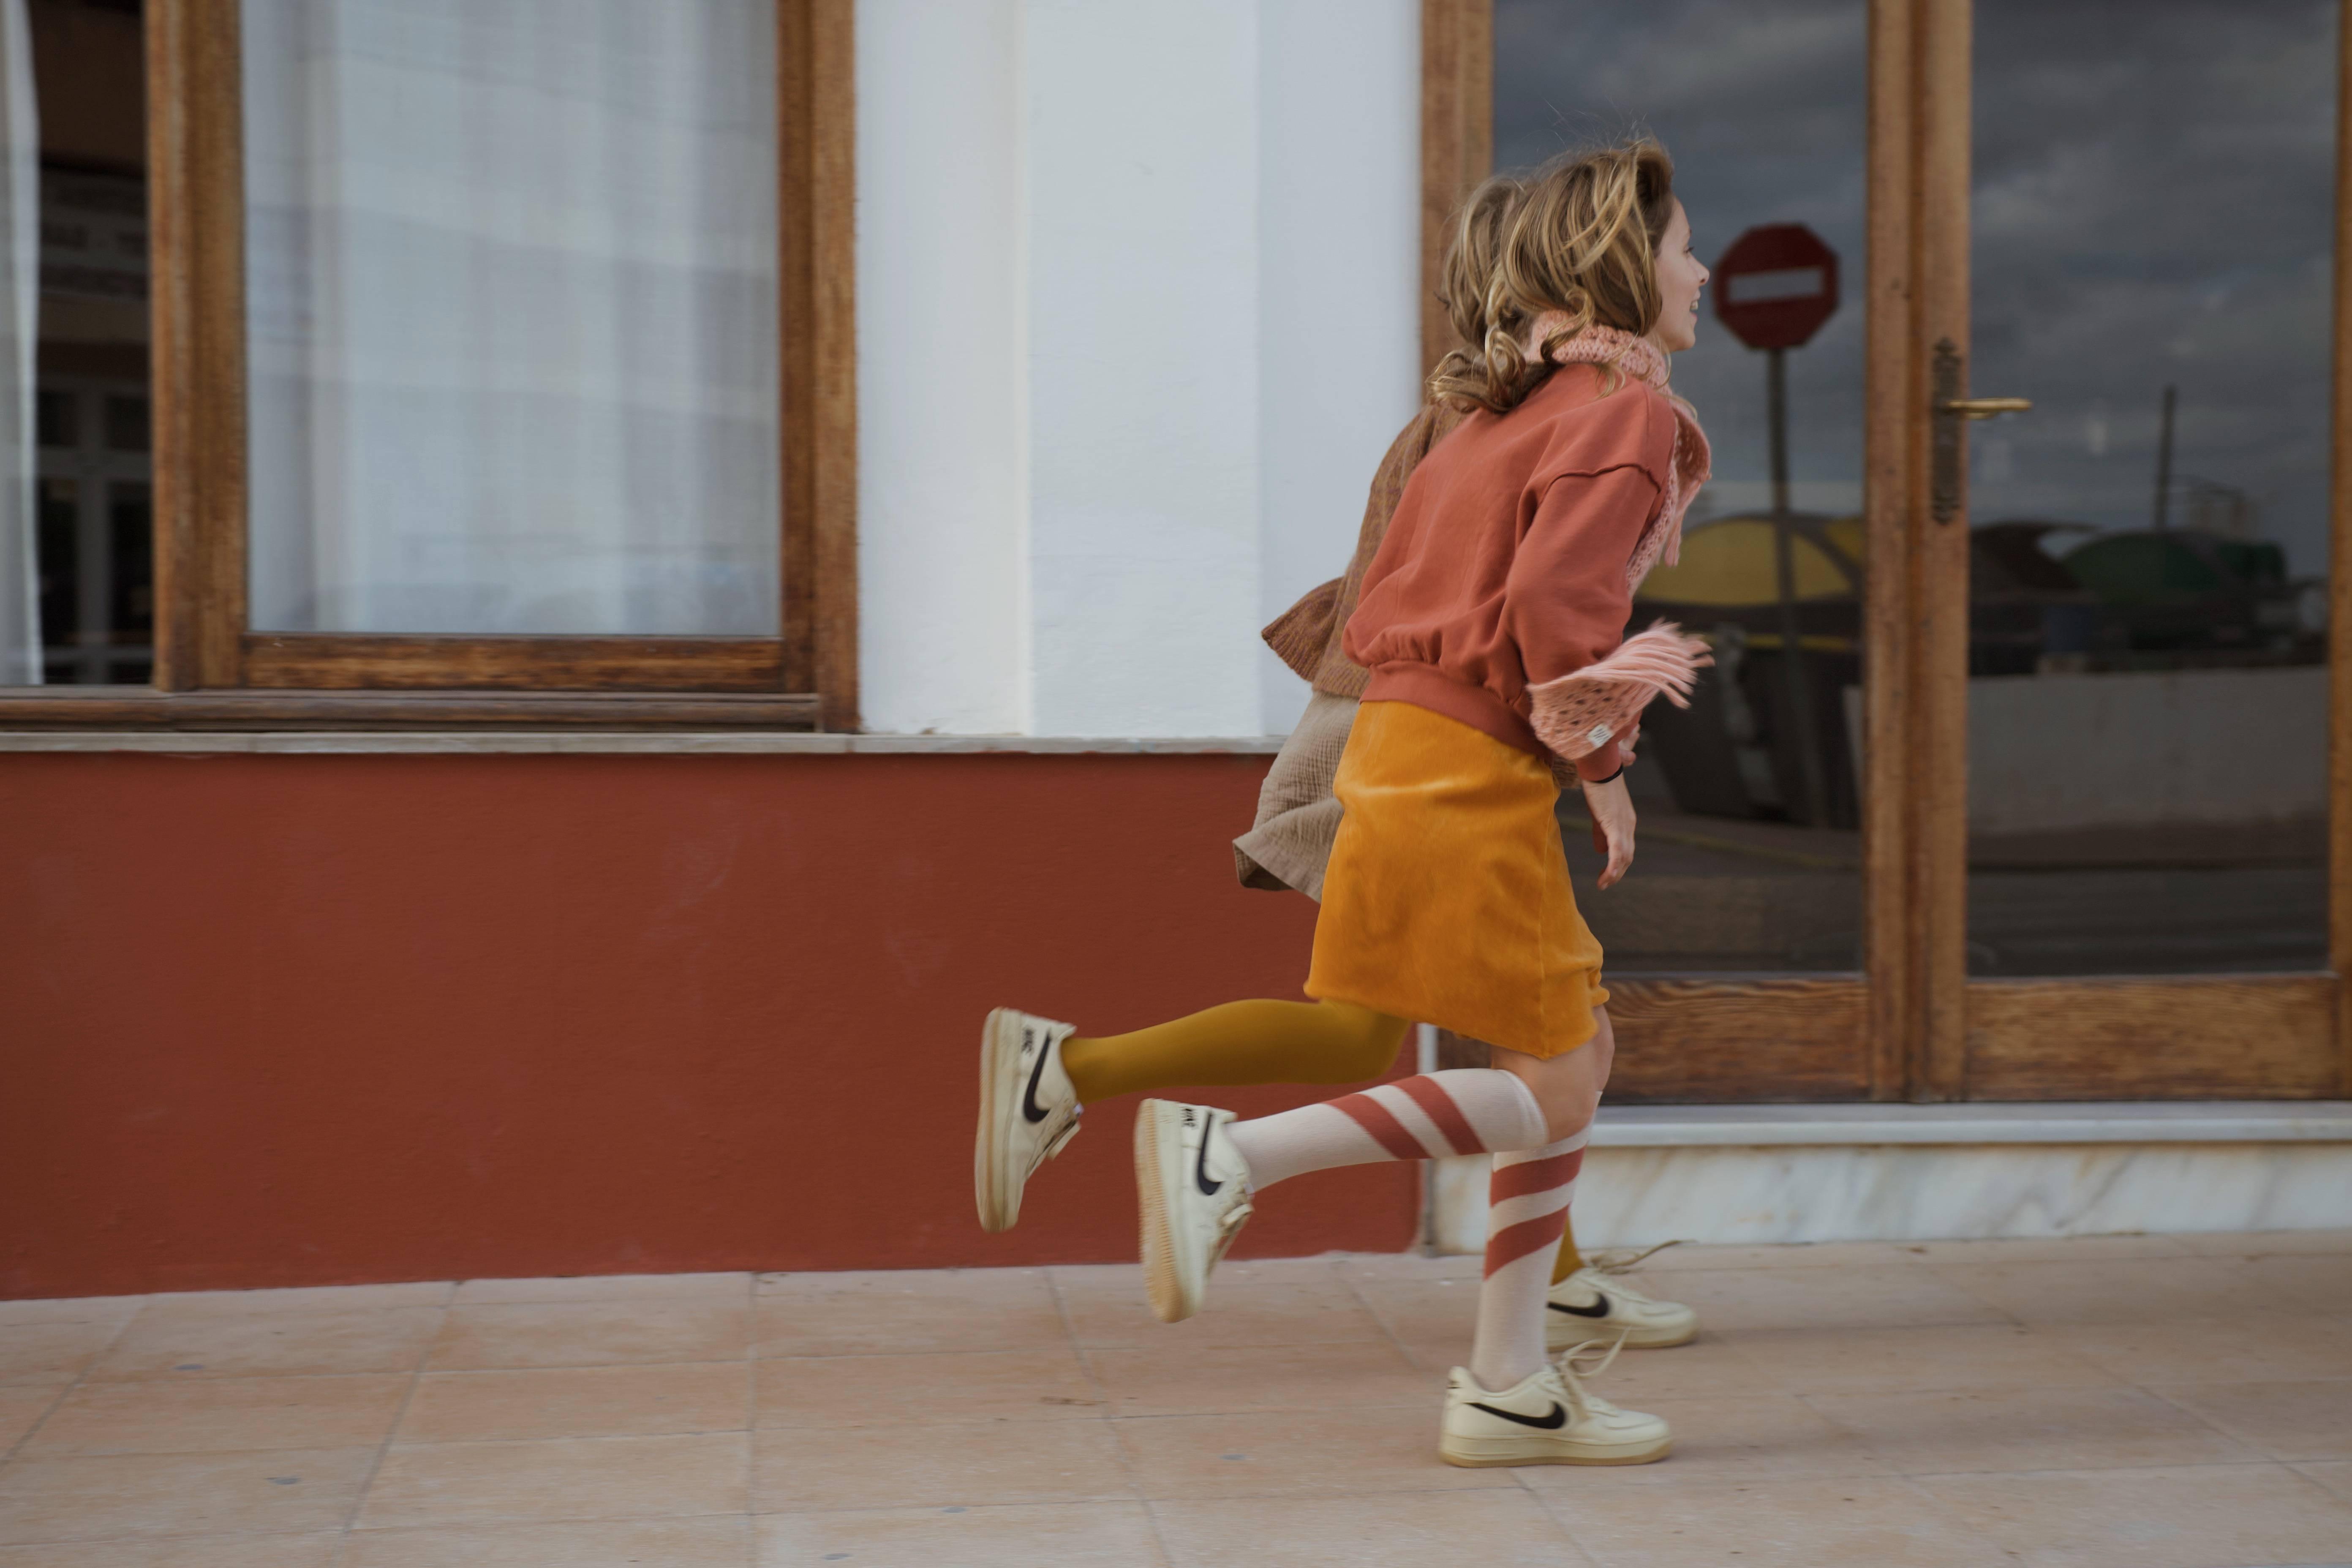 Smart brands for little ones